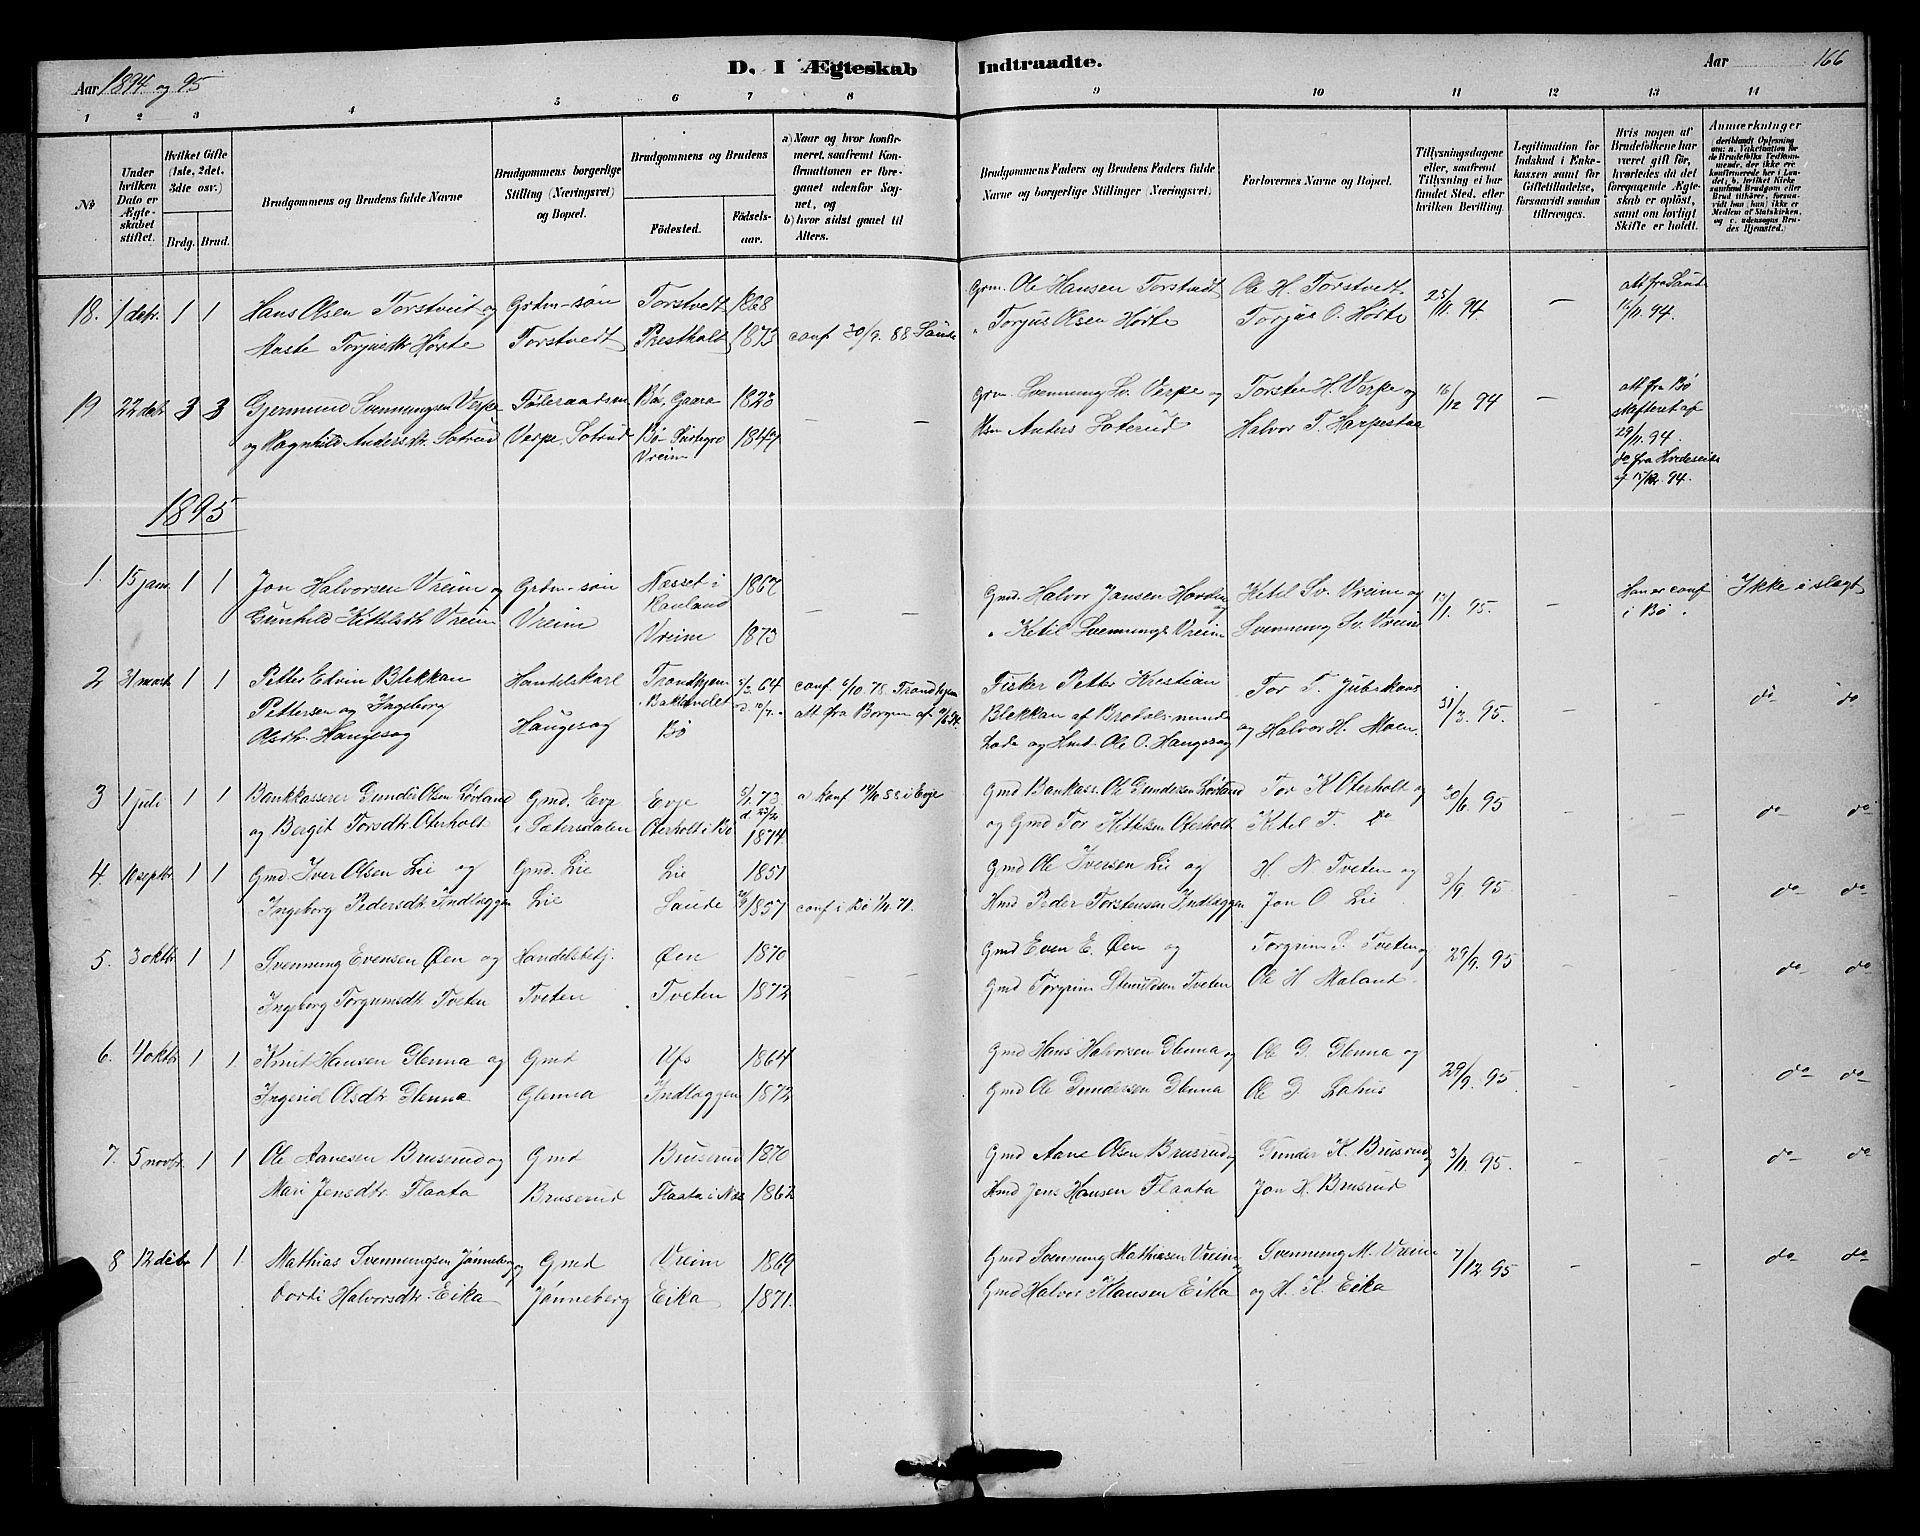 SAKO, Bø kirkebøker, G/Ga/L0005: Klokkerbok nr. 5, 1883-1897, s. 166